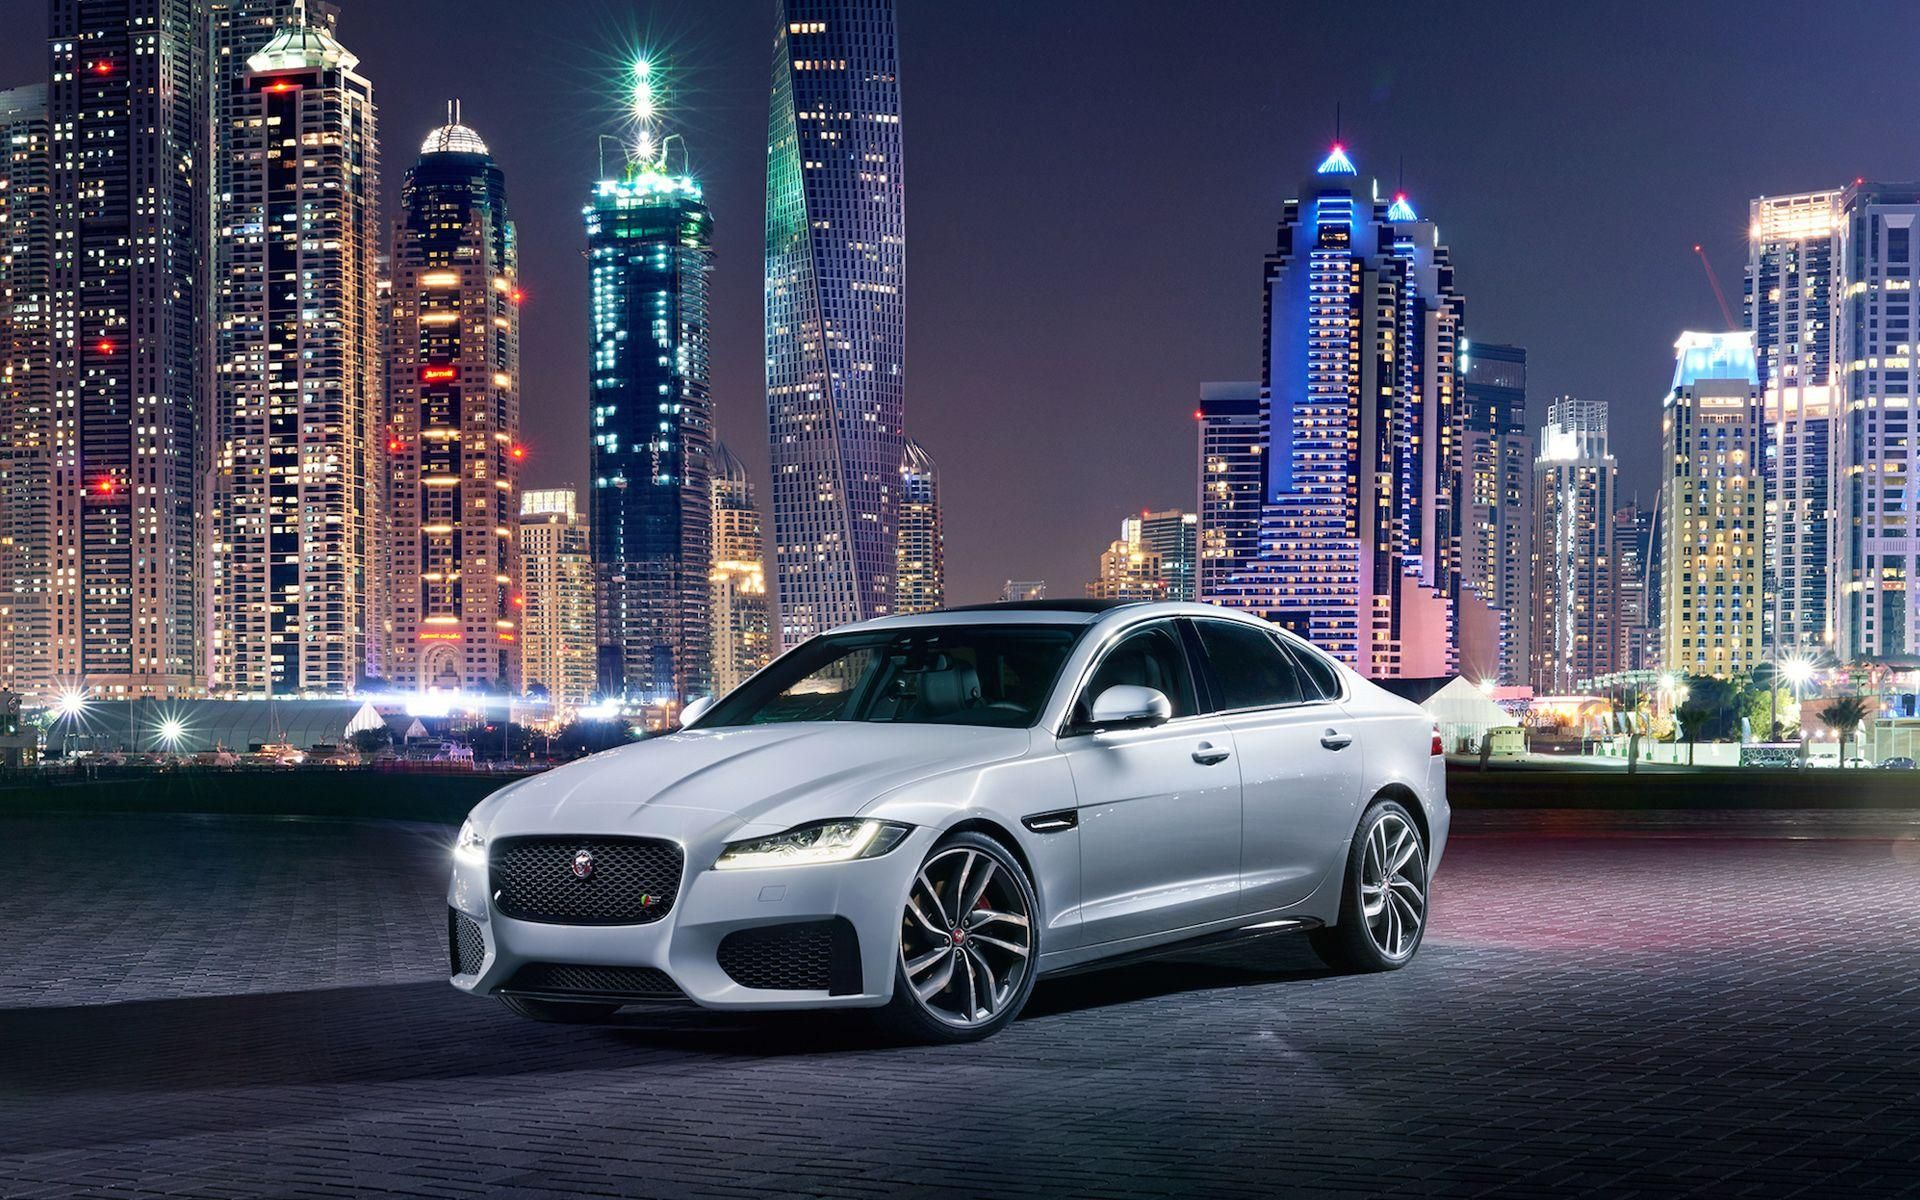 Jaguar Cars Hd Wallpapers 1080p For Pc